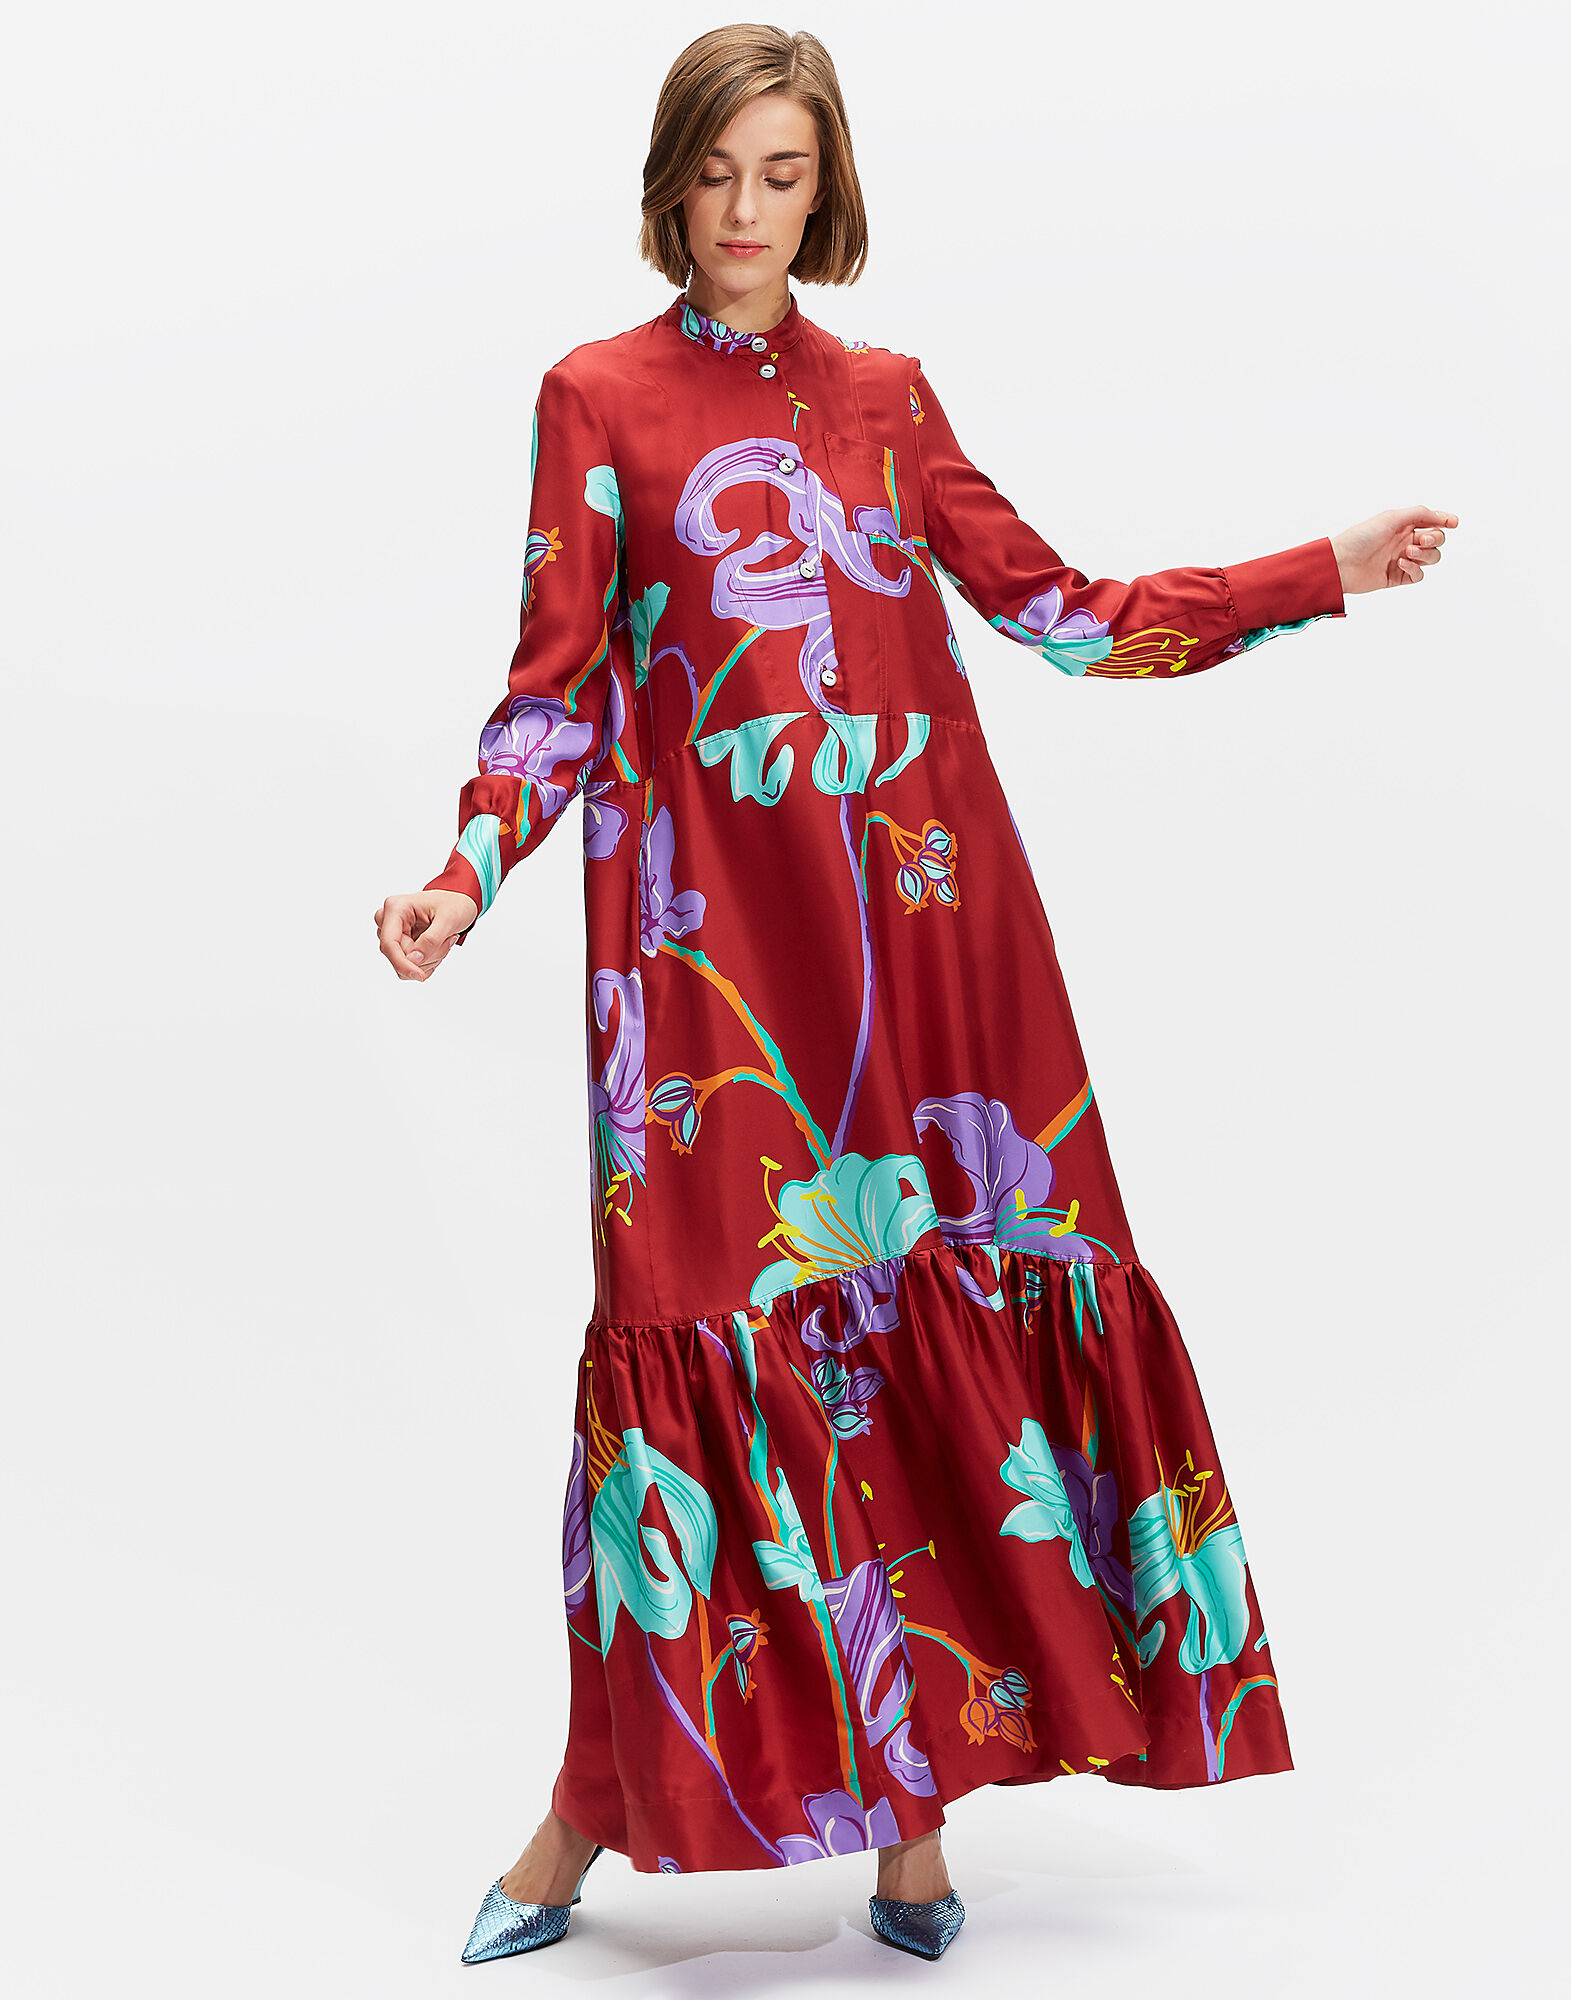 La DoubleJ LDJ Ready to Wear - Dresses | La DoubleJ - Maxi Shirt Dress